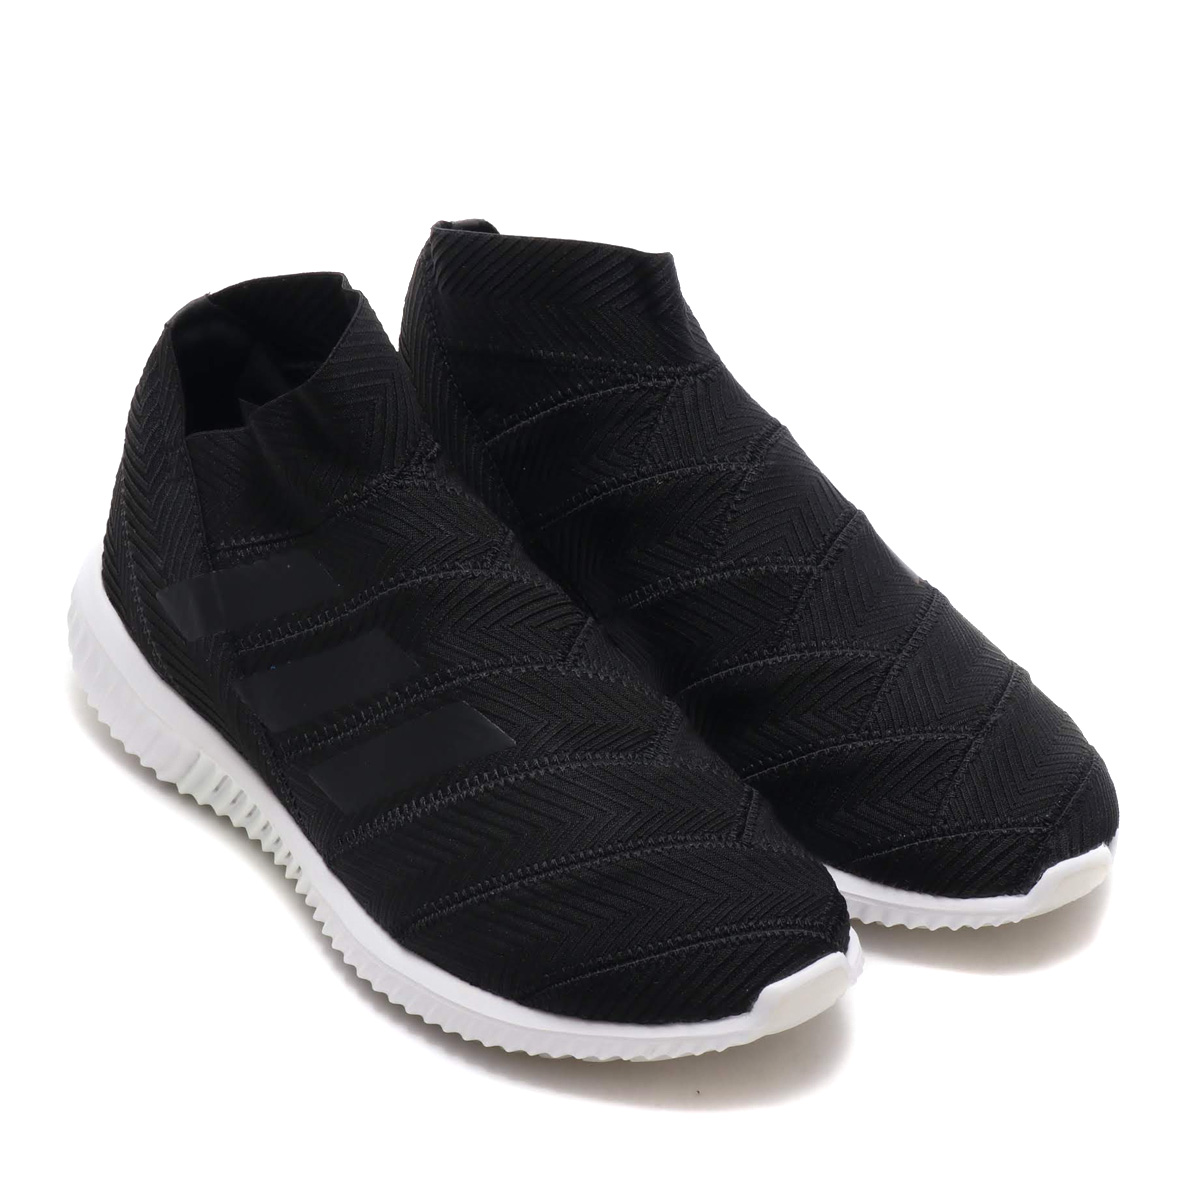 48dfecc7f adidas NEMEZIZ TANGO 18.1 TR (Adidas Nemesis tango) CORE BLACK/CORE BLACK/  ...